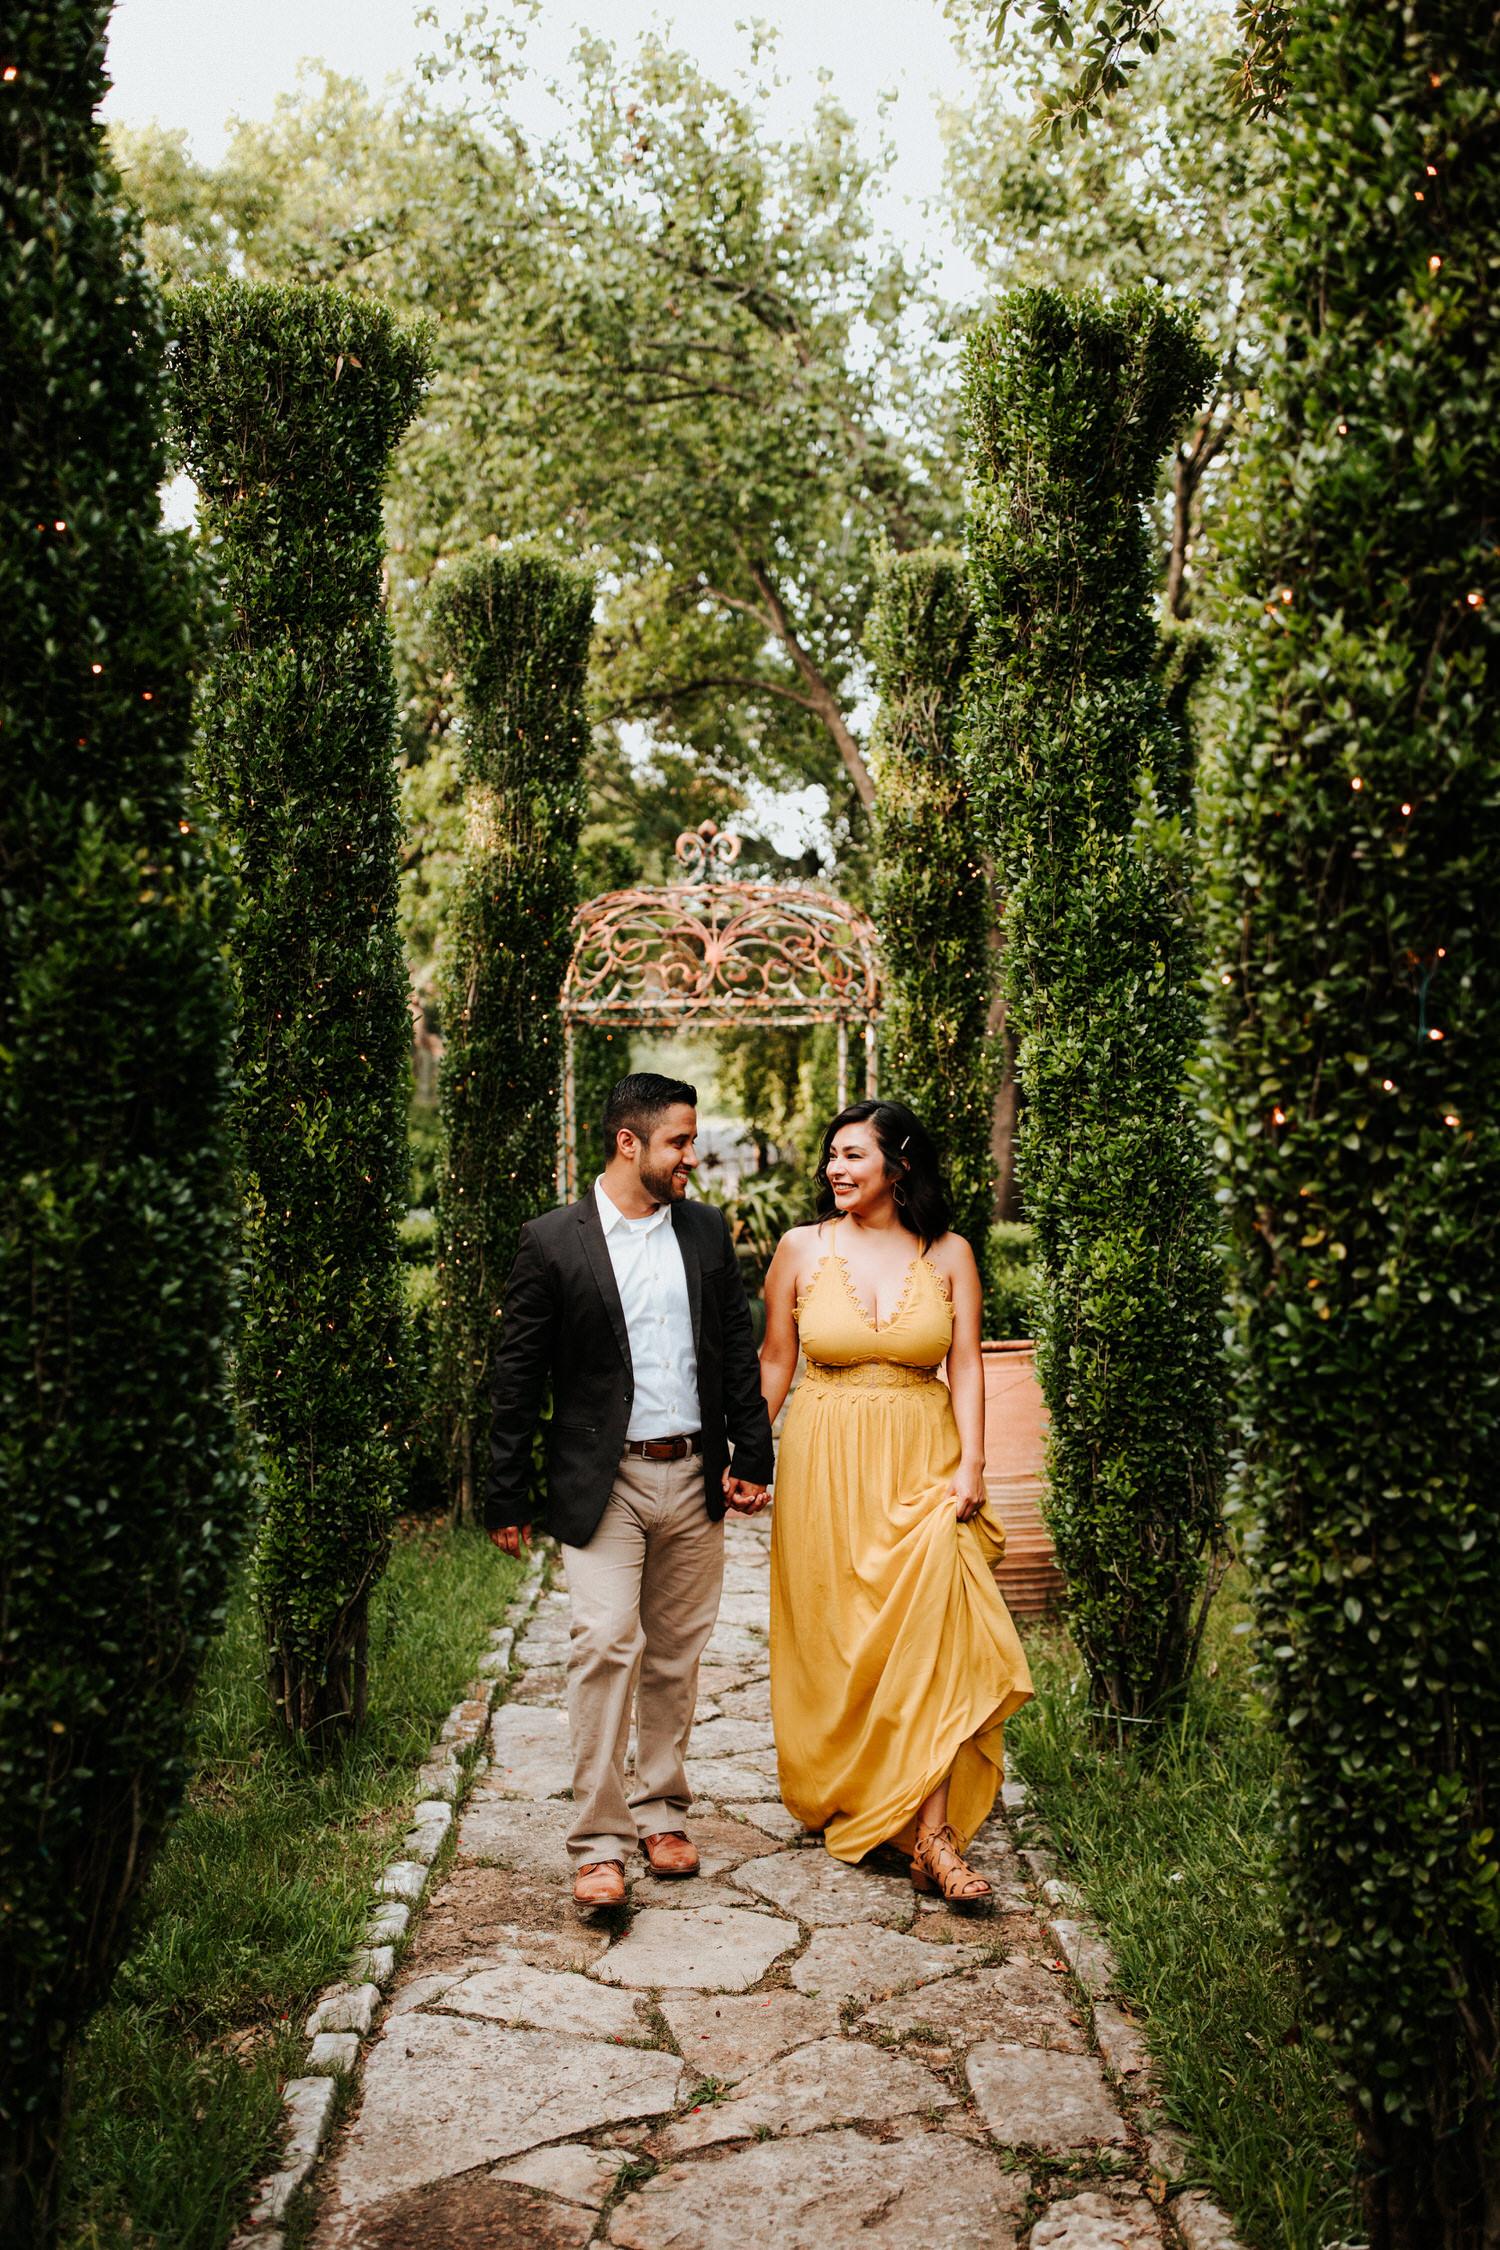 Jennifer's Gardens Engagement Session